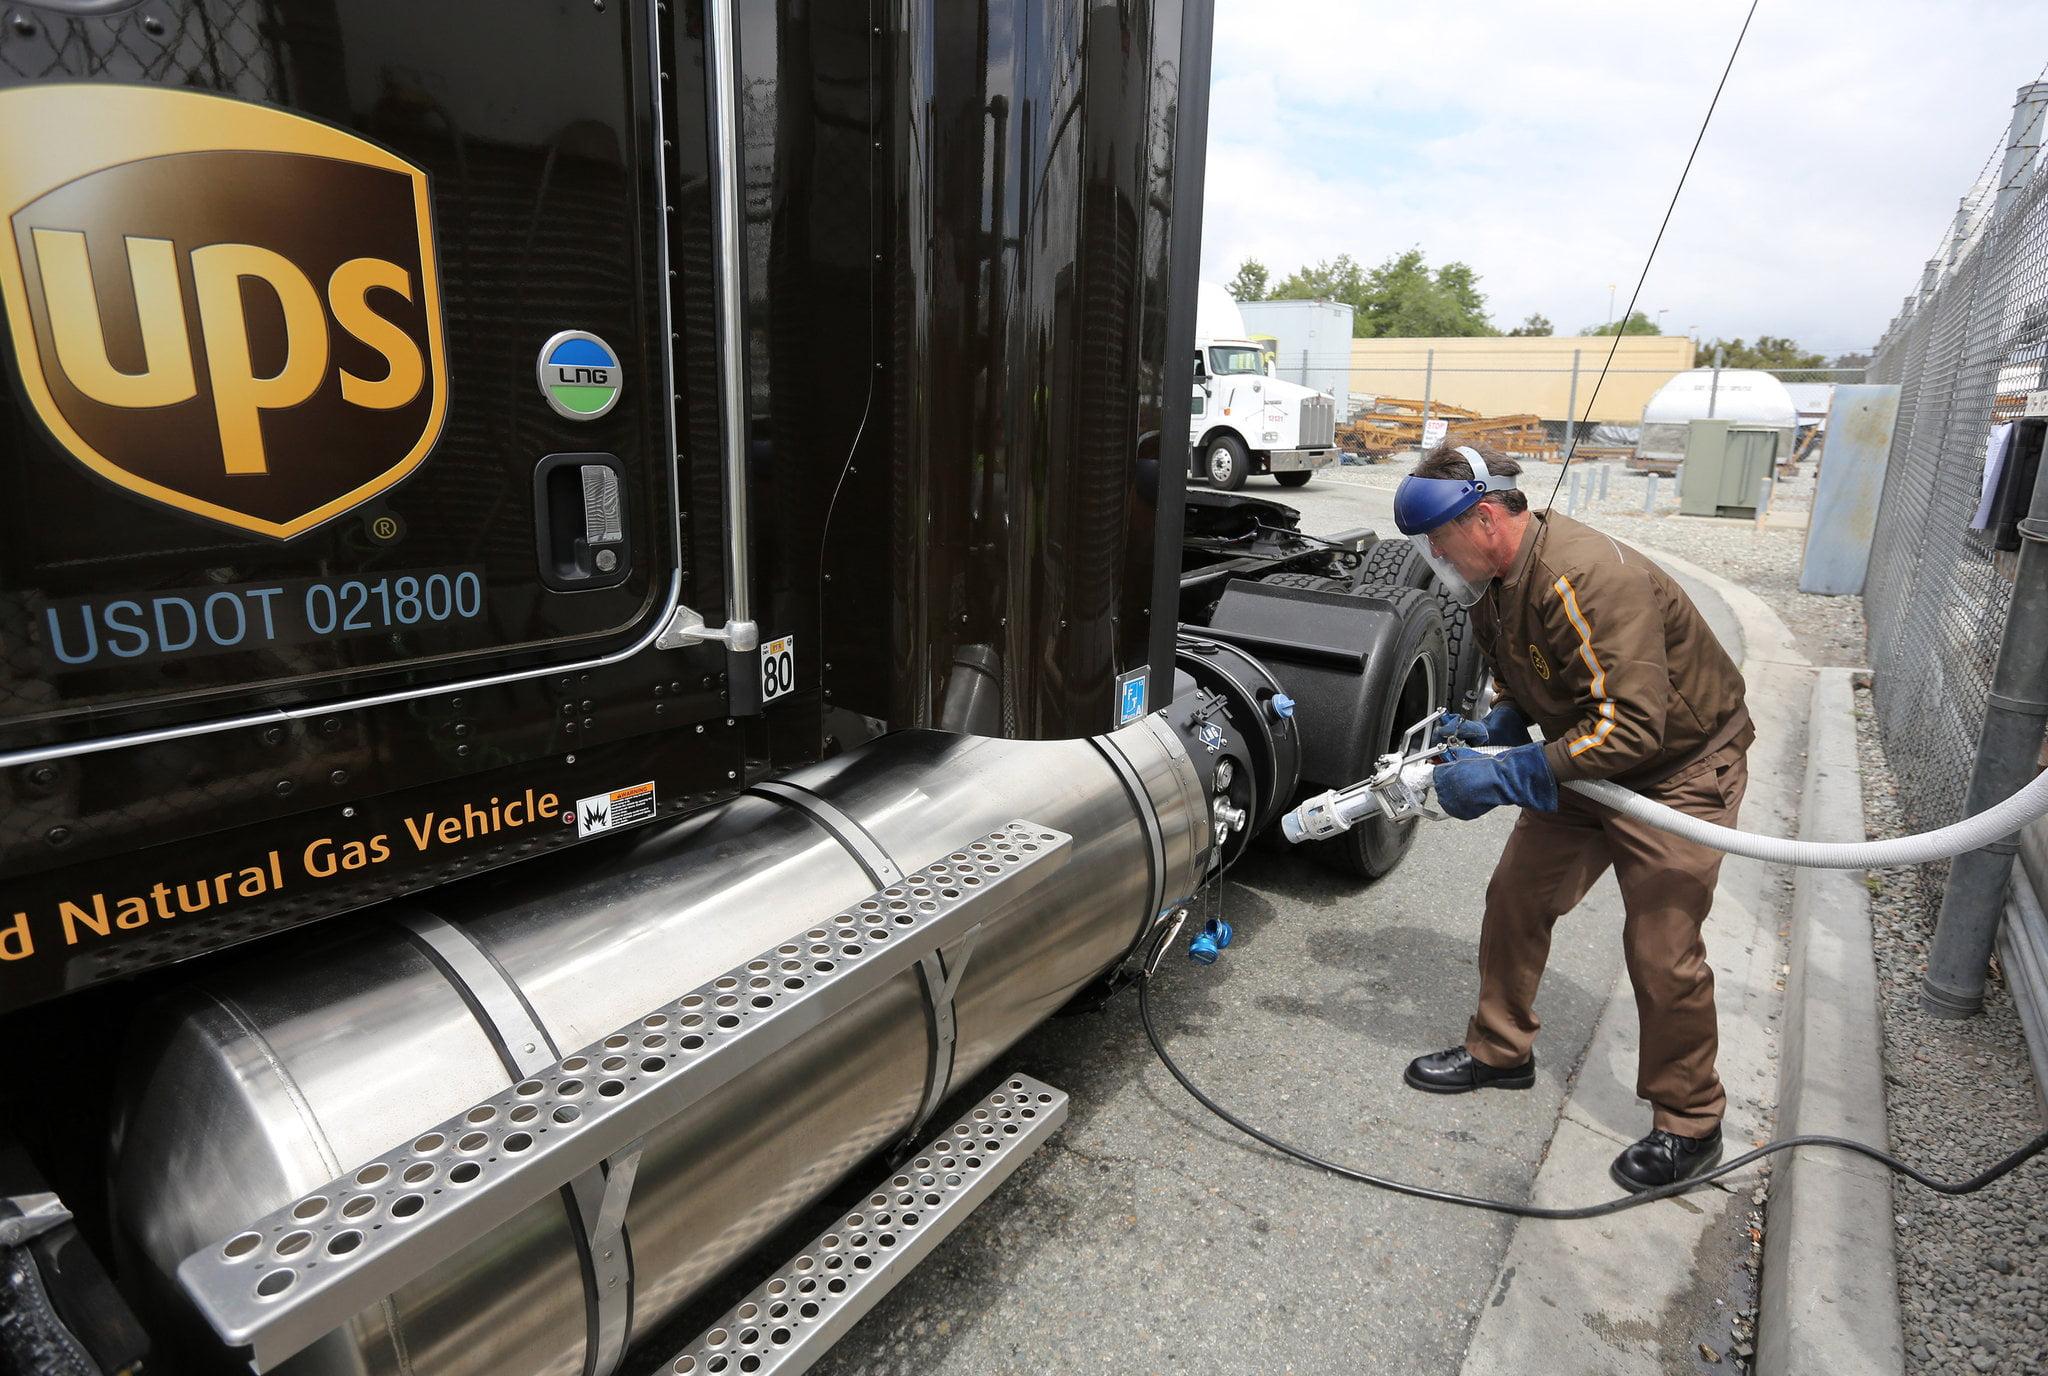 Thanks A Million Ames UPS Drivers! 7